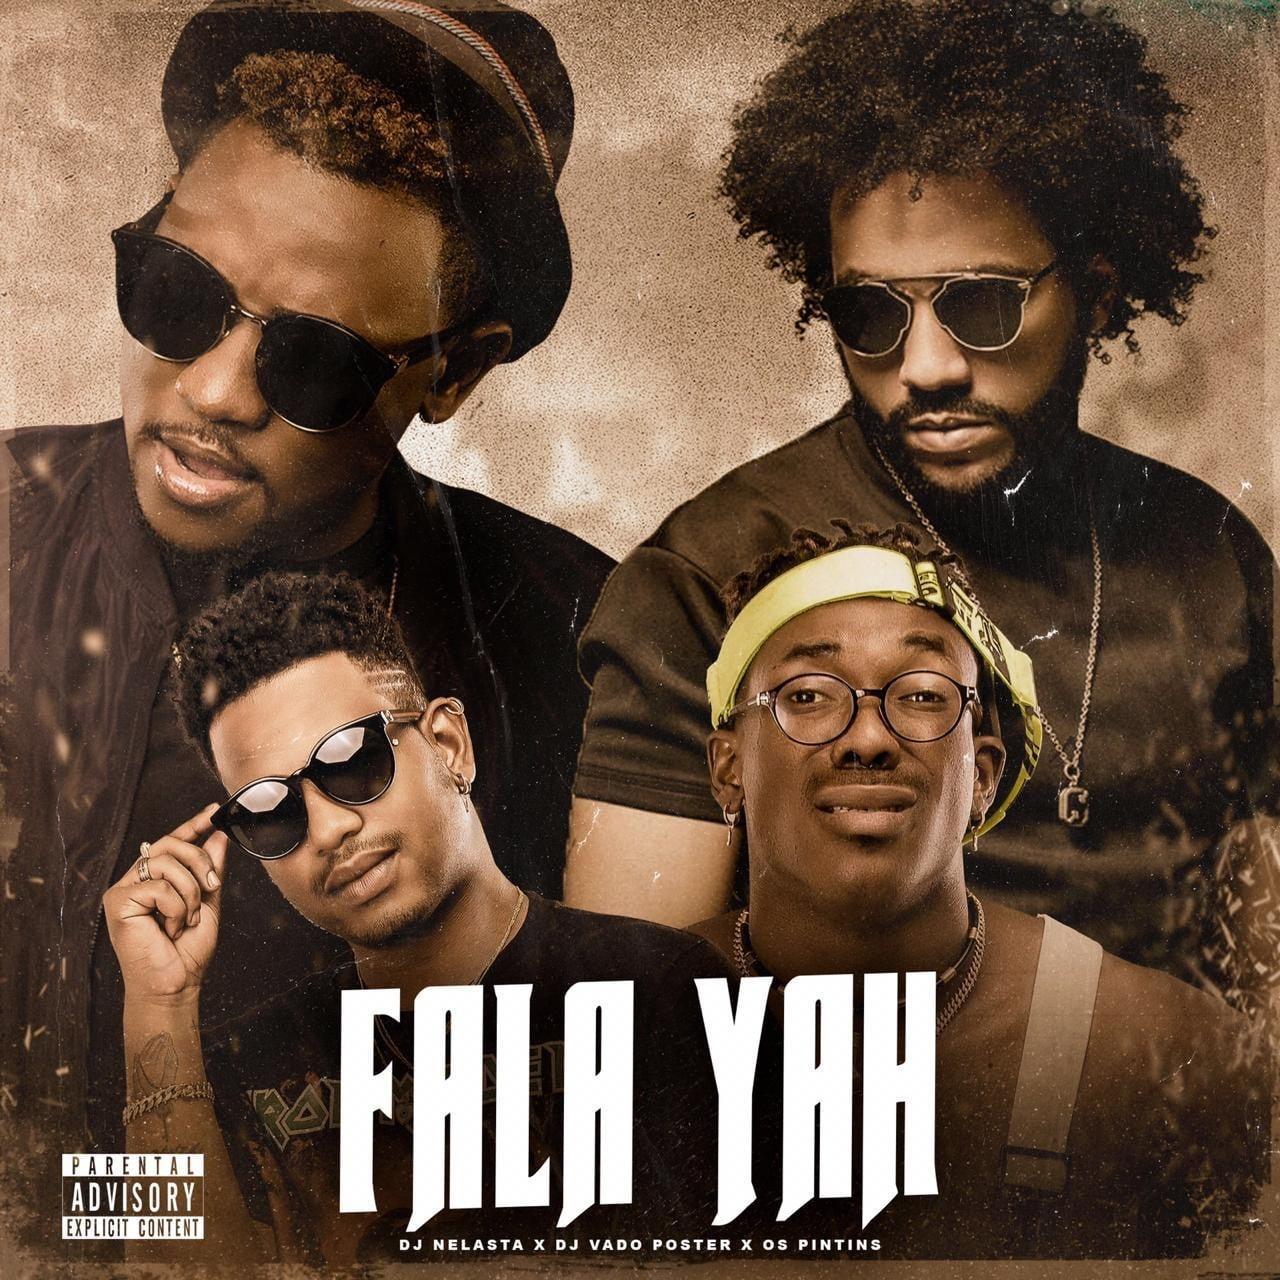 DJ Nelasta & Dj Vado Poster ft Nerú Americano & Scró Q Cuia - Fala Yah